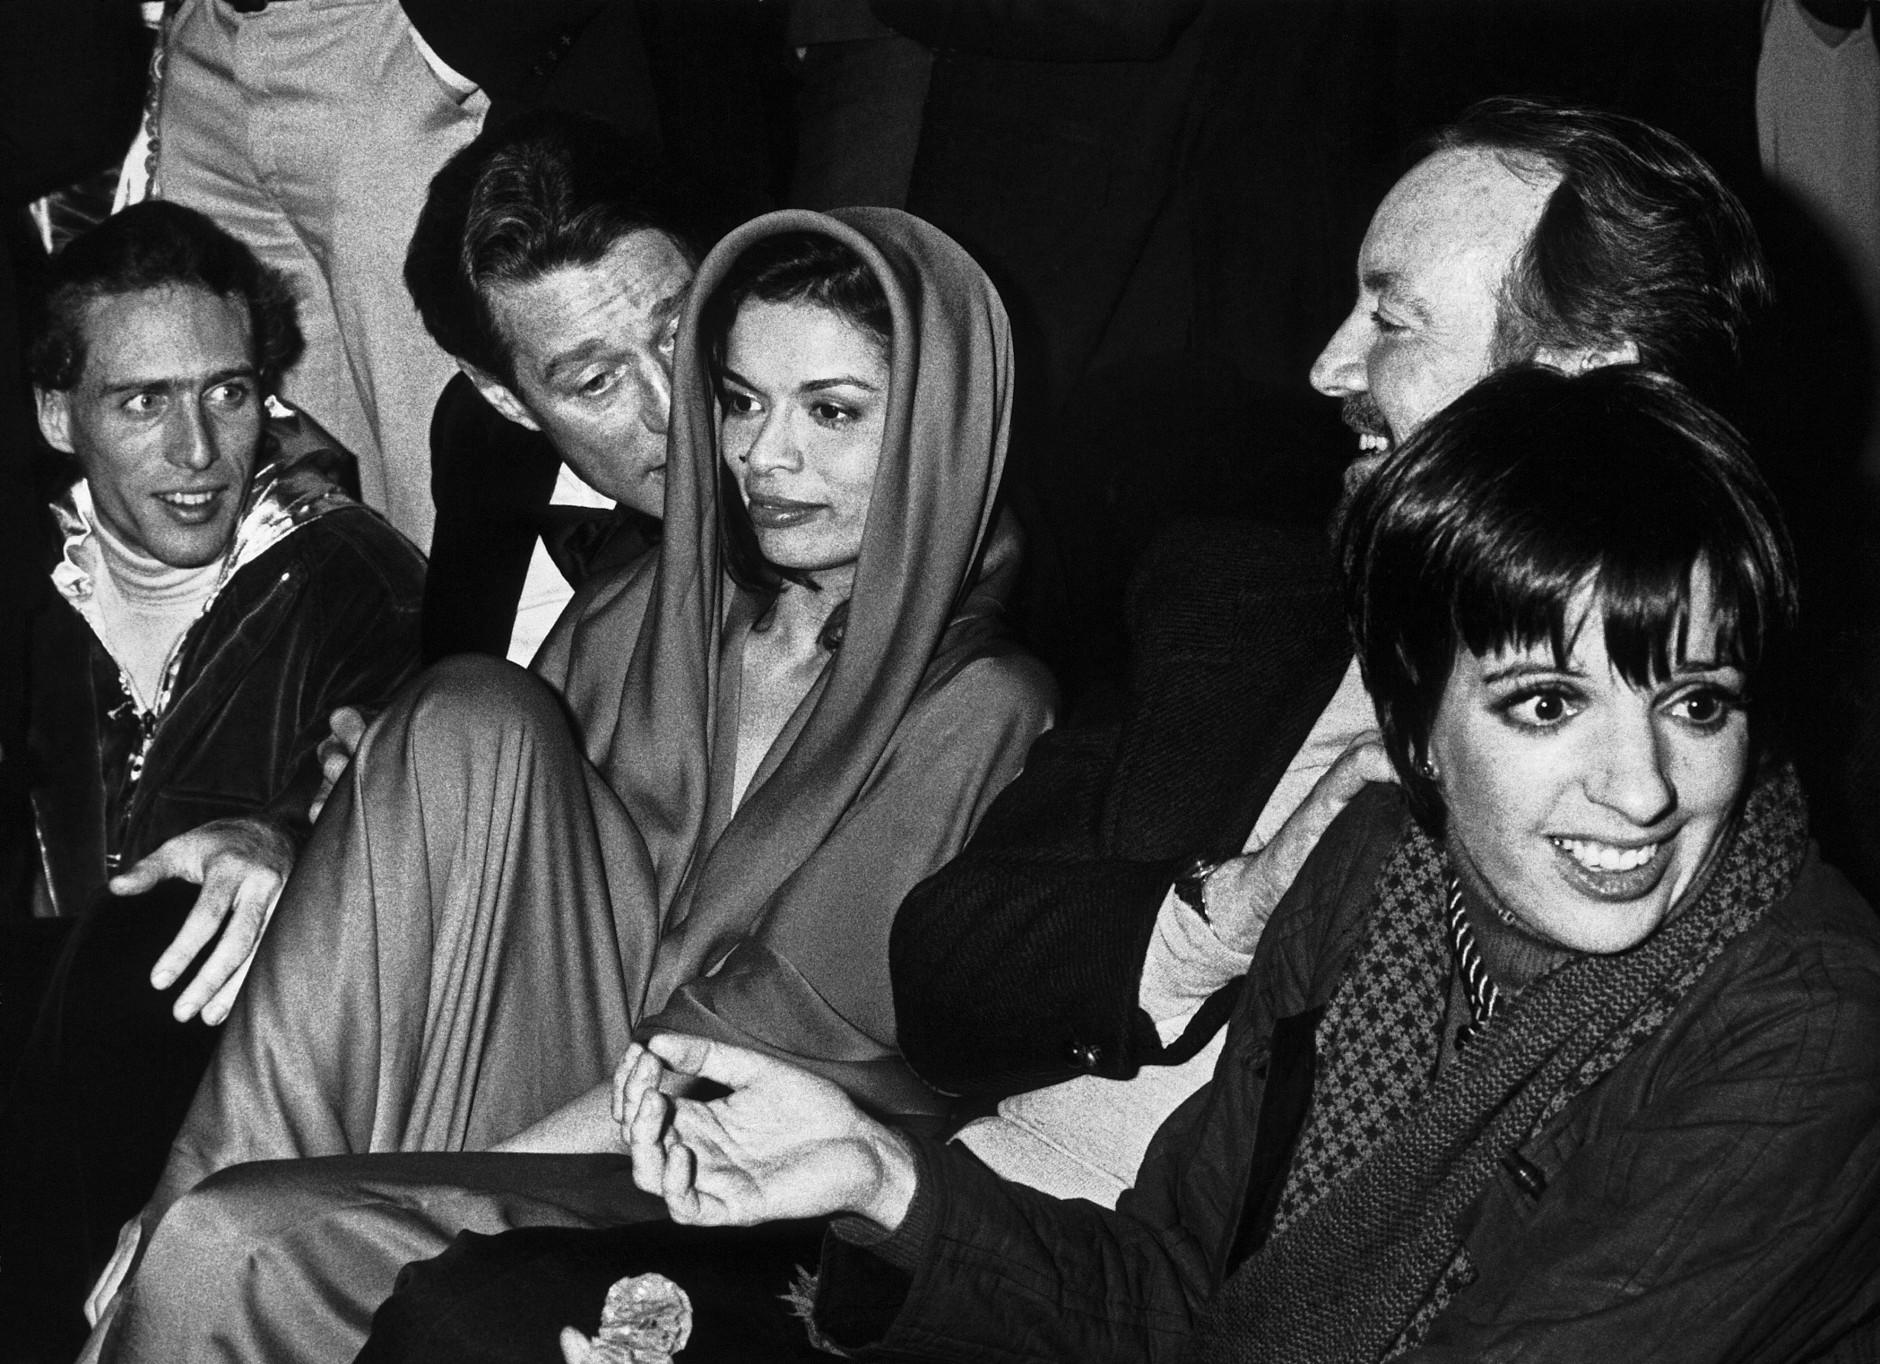 Ron Galella: Halston, Bianca Jagger and Liza Minelli, Studio 54, New York, January 1978. © Ron Galella, Ltd.